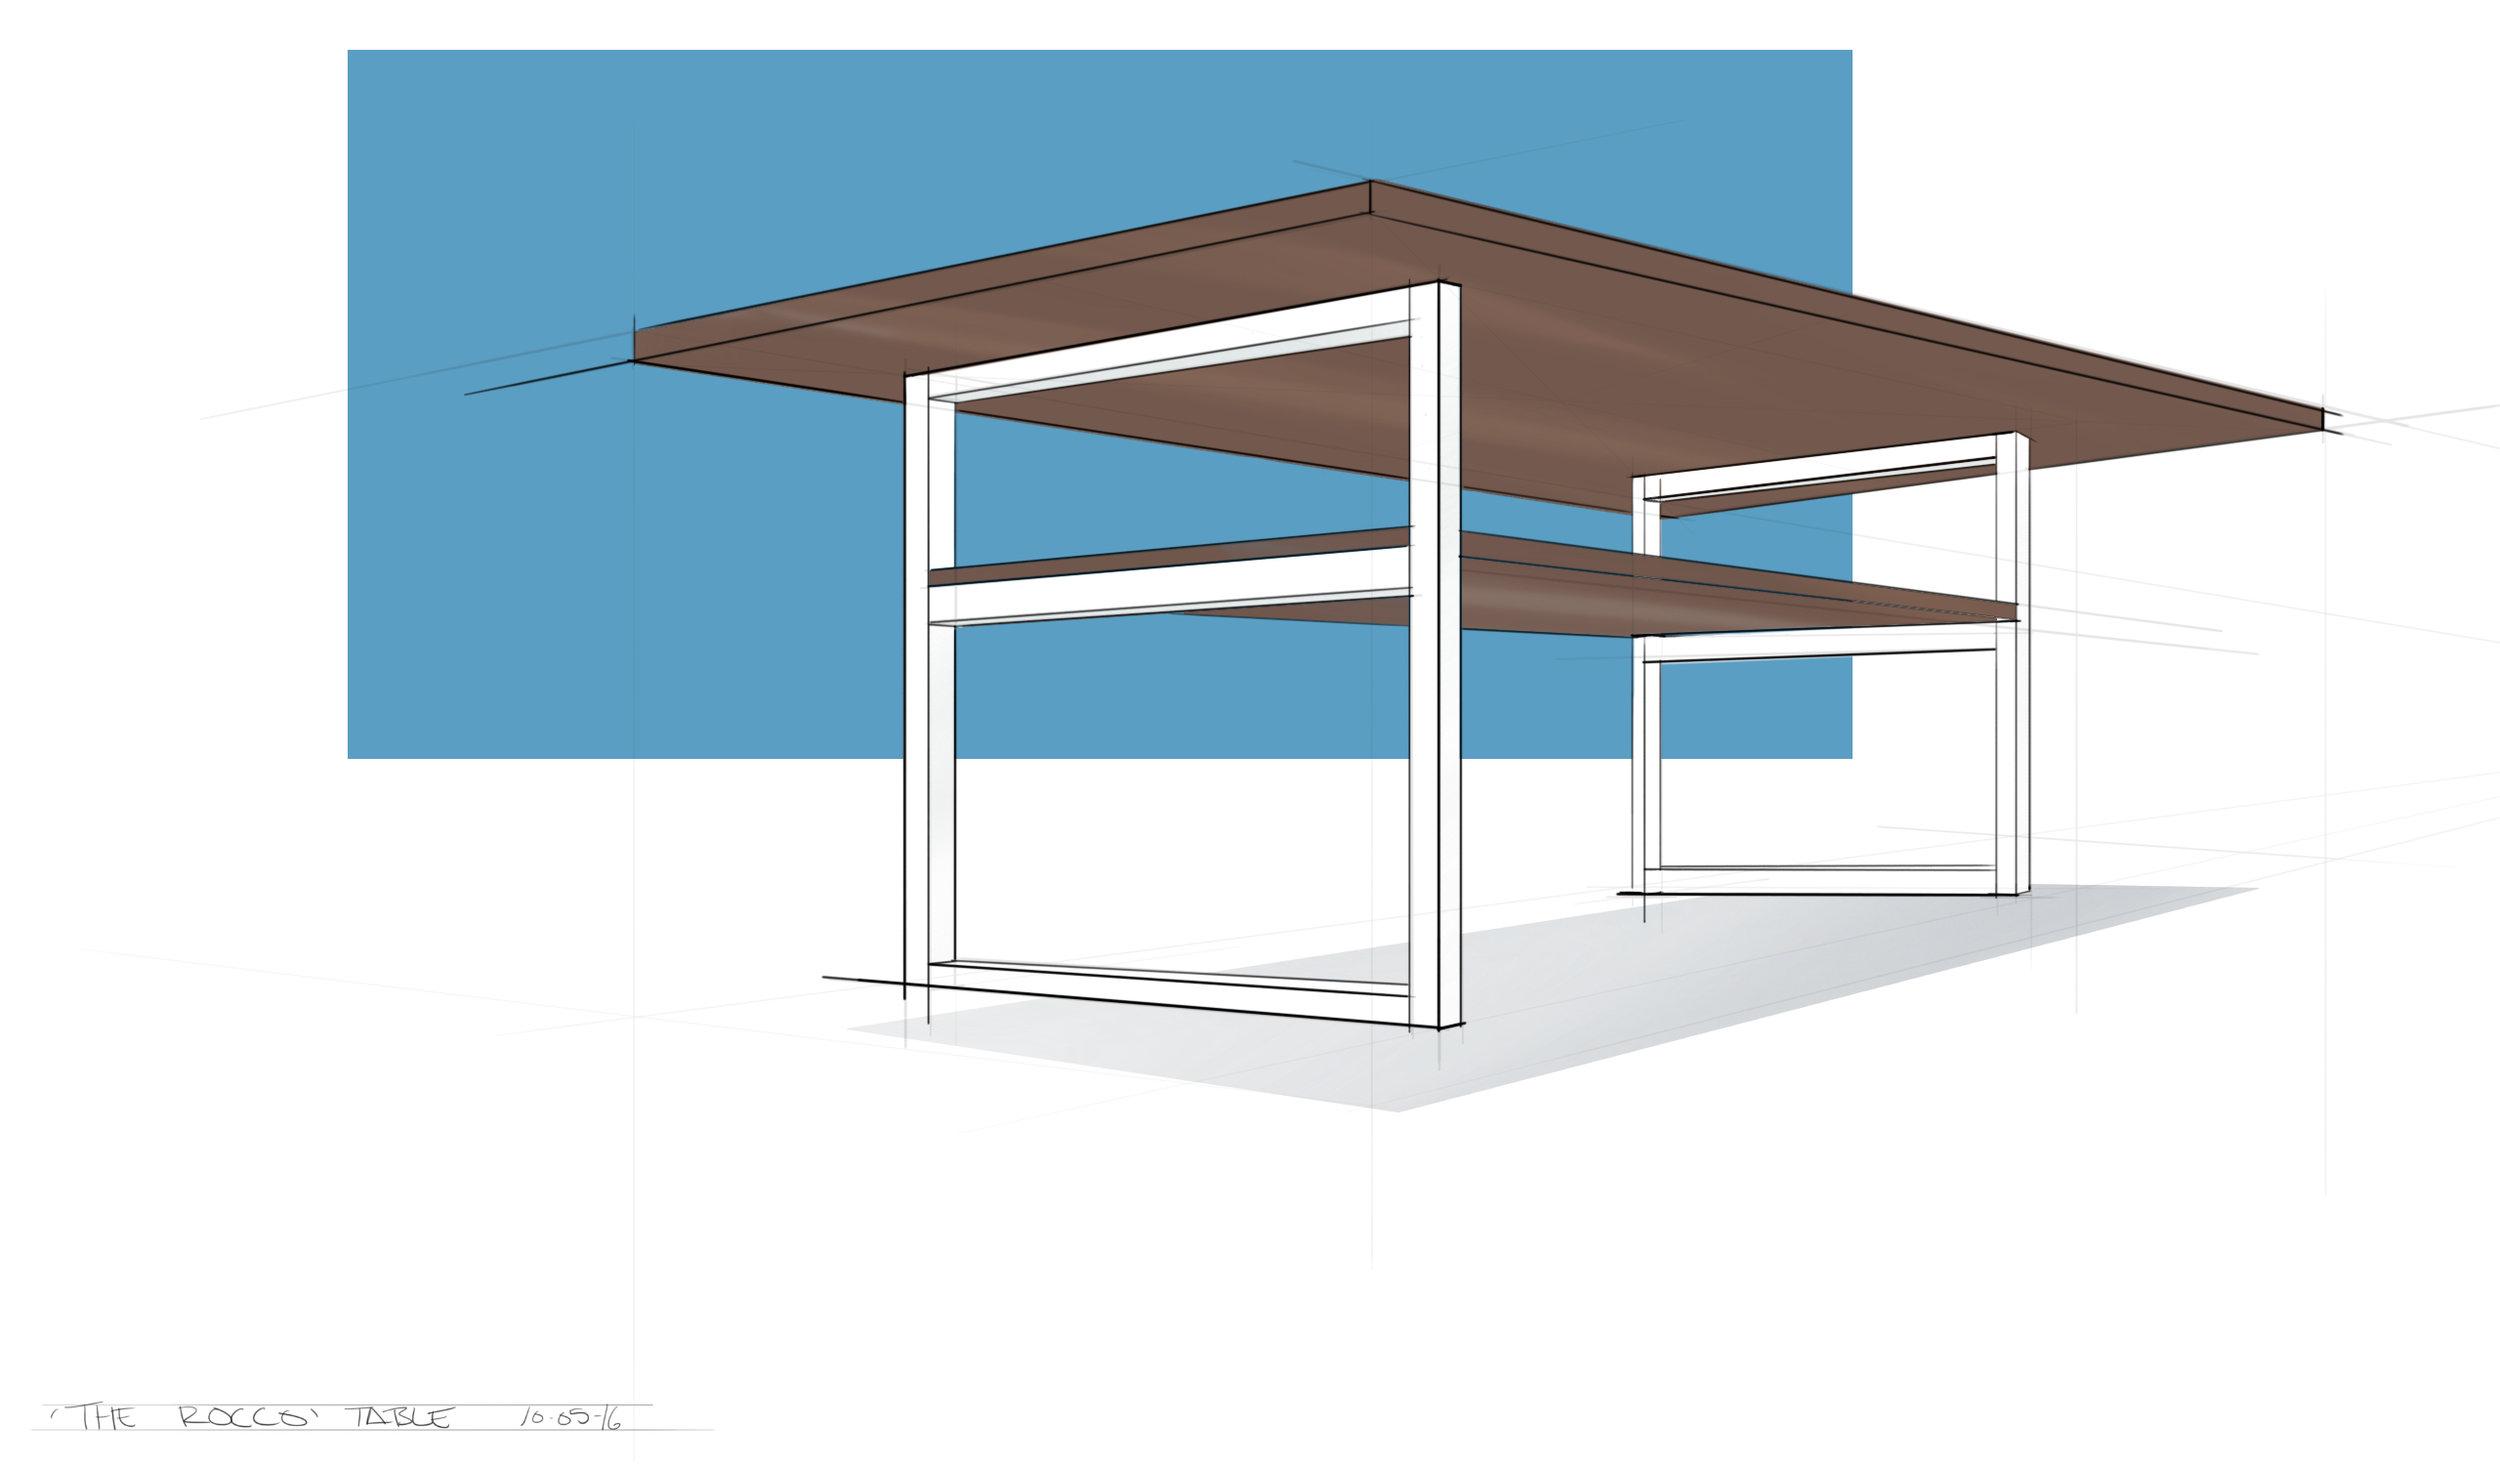 CoffeeTable_JW_Sketch1_100516 copy.jpg